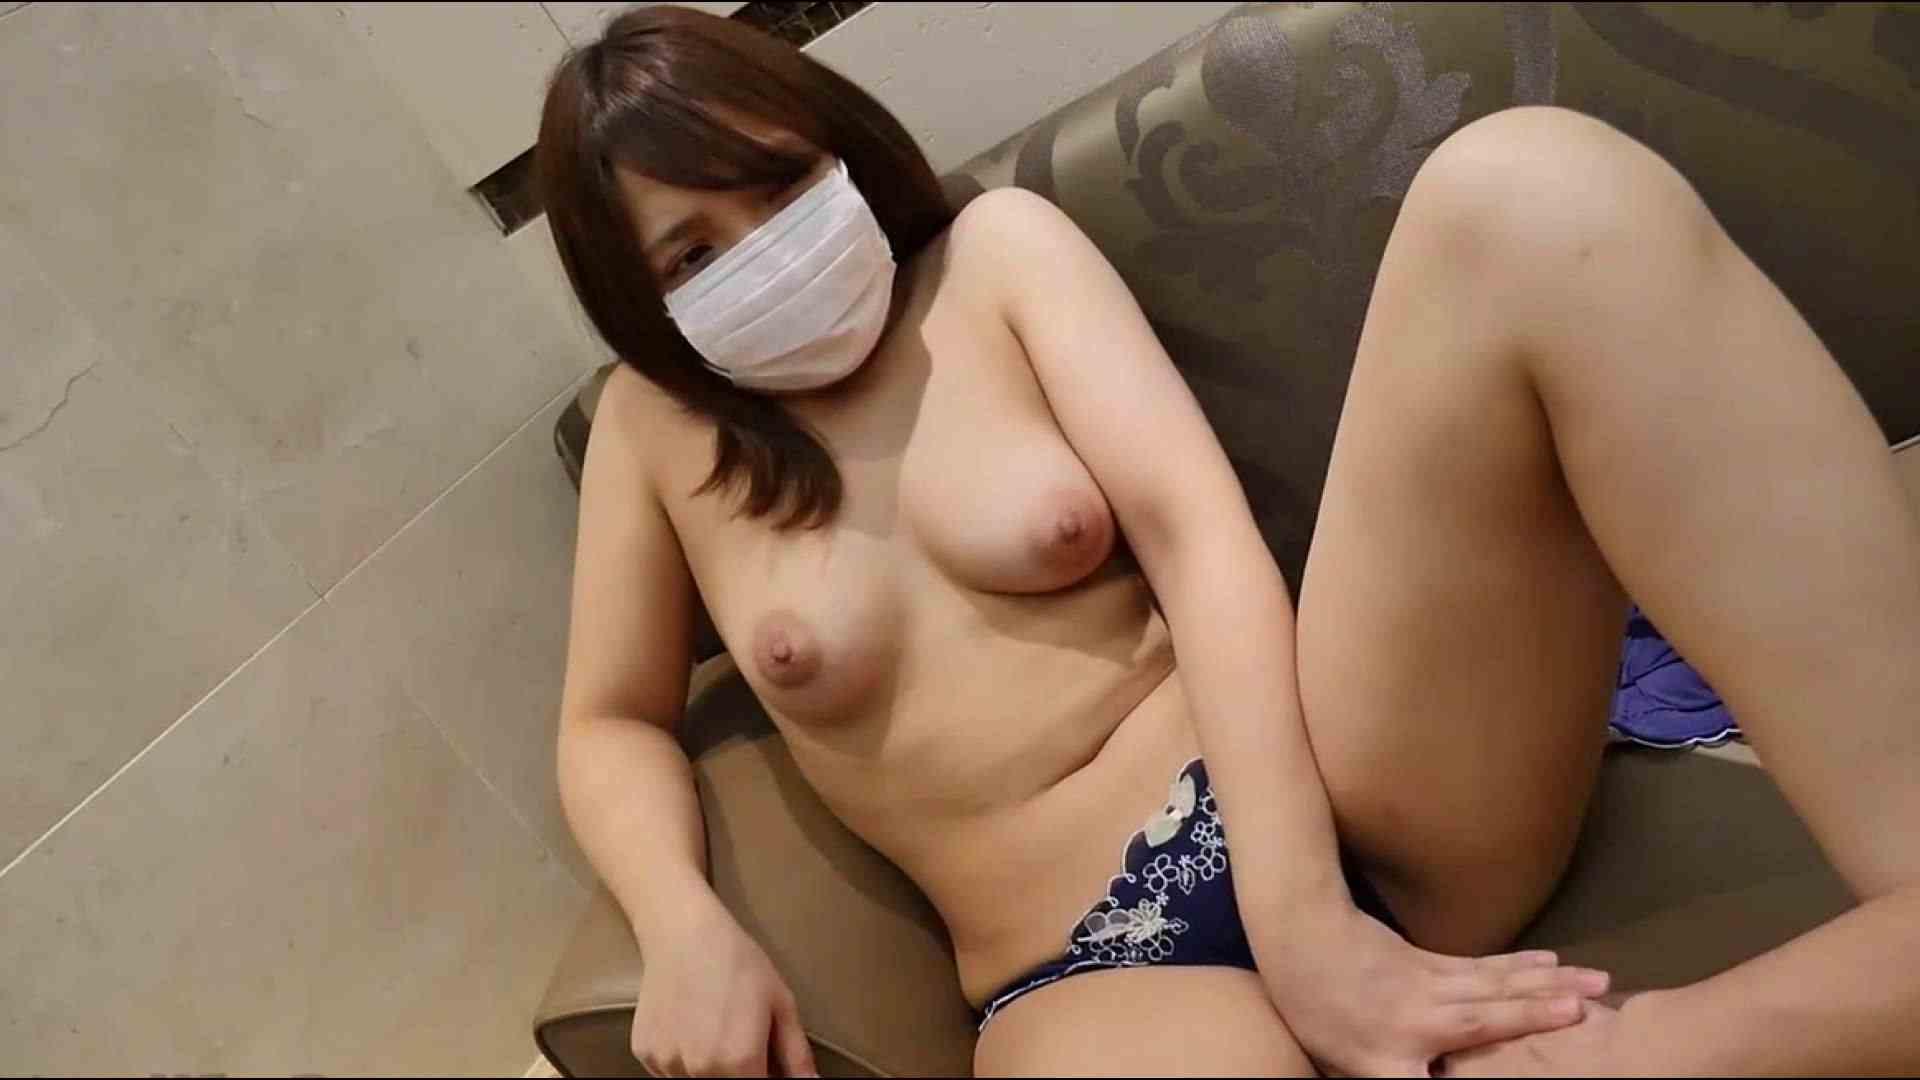 S級厳選美女ビッチガールVol.41 前編 OL女体   美女  105連発 83